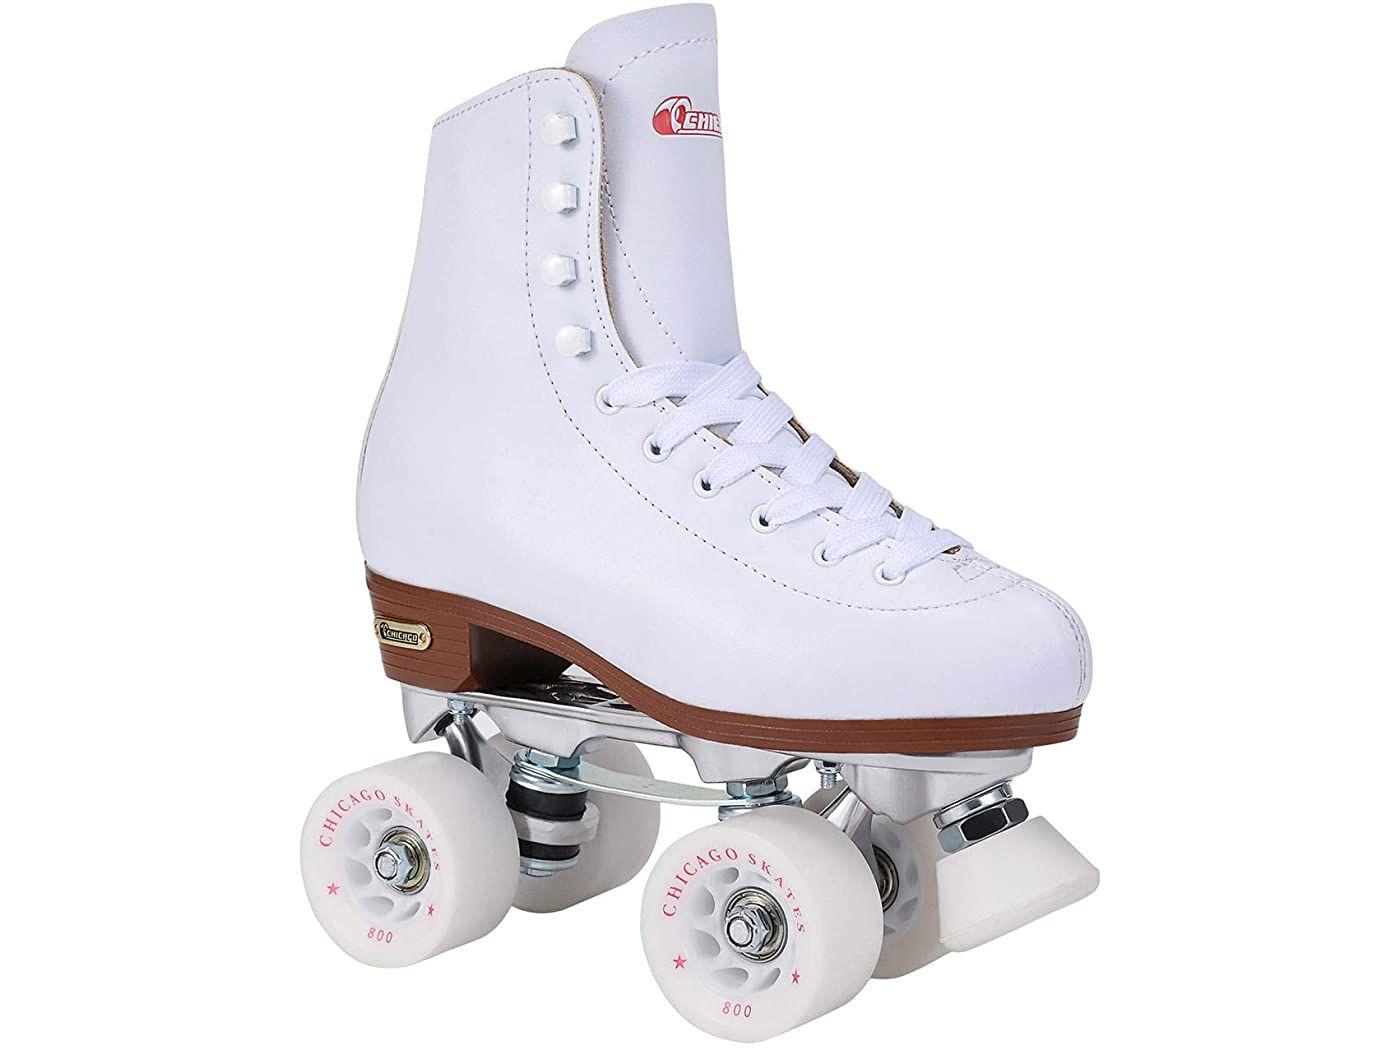 Chicago Leather-Lined Roller Skates